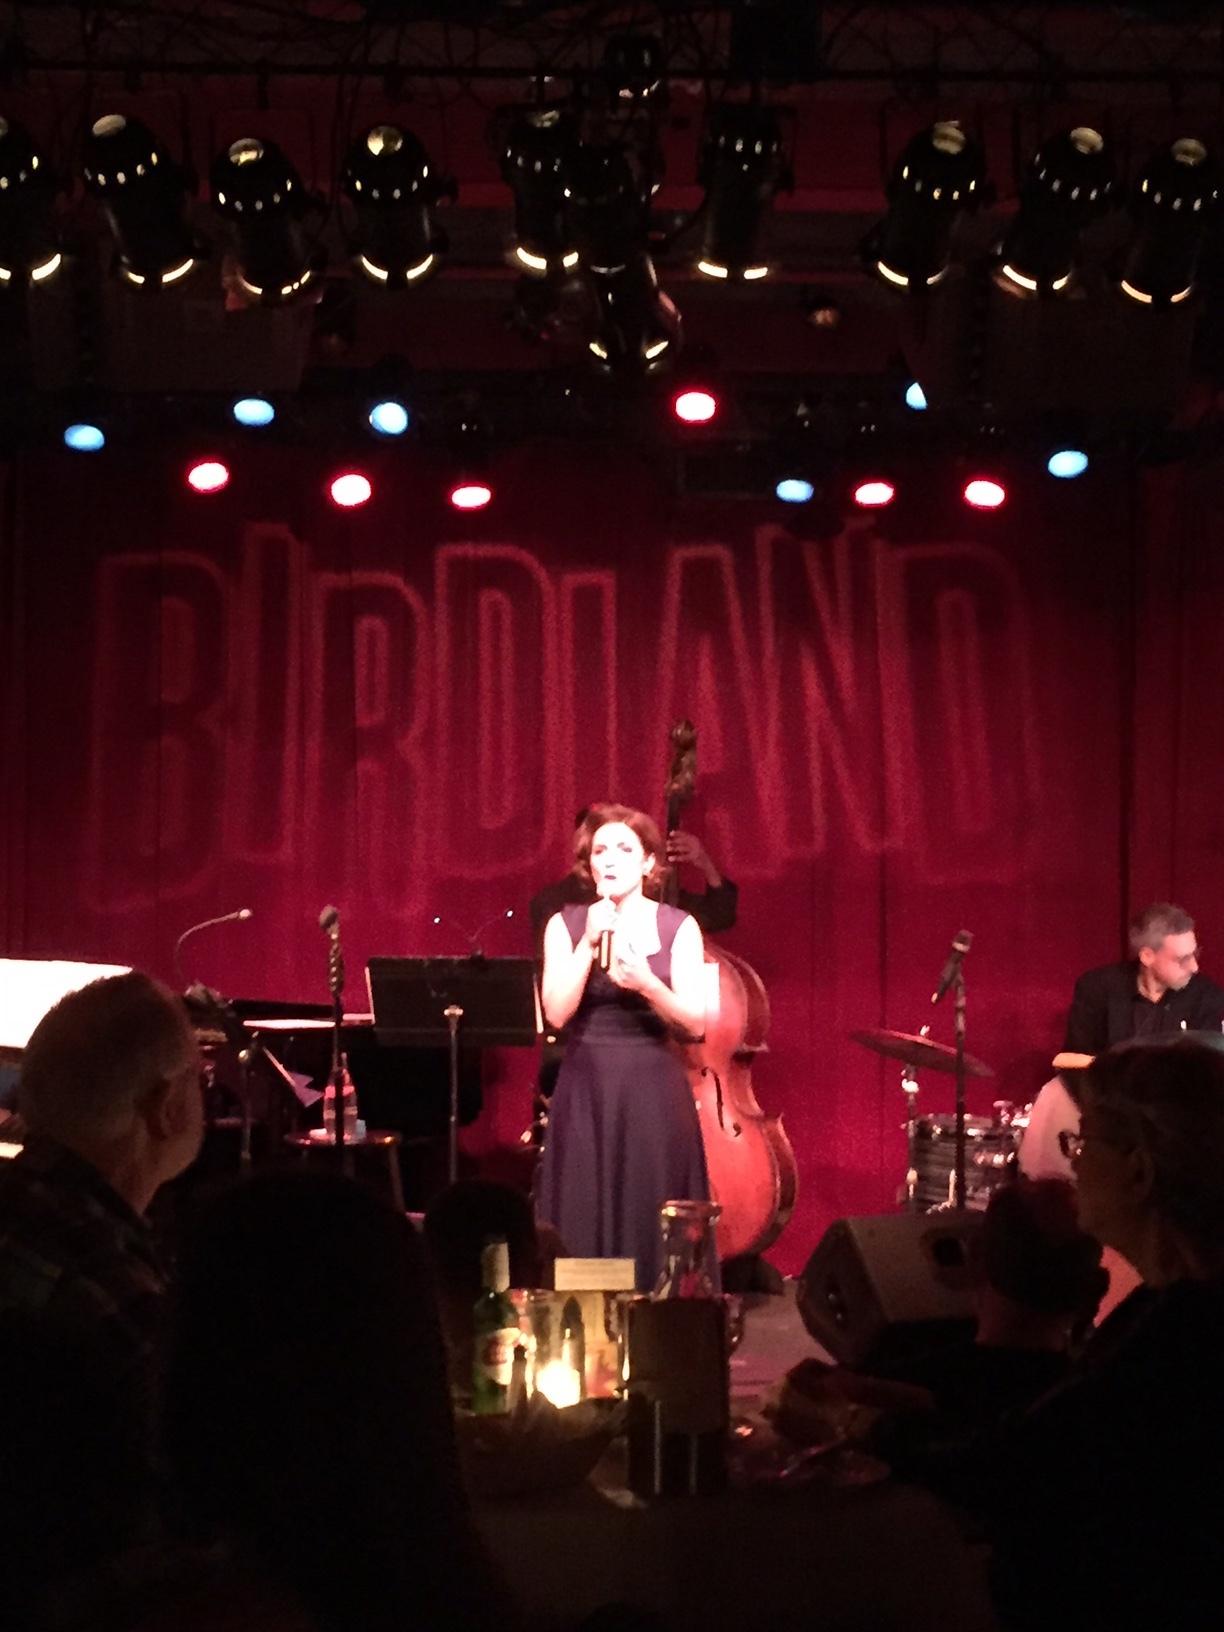 Birdland Jazz Club performance